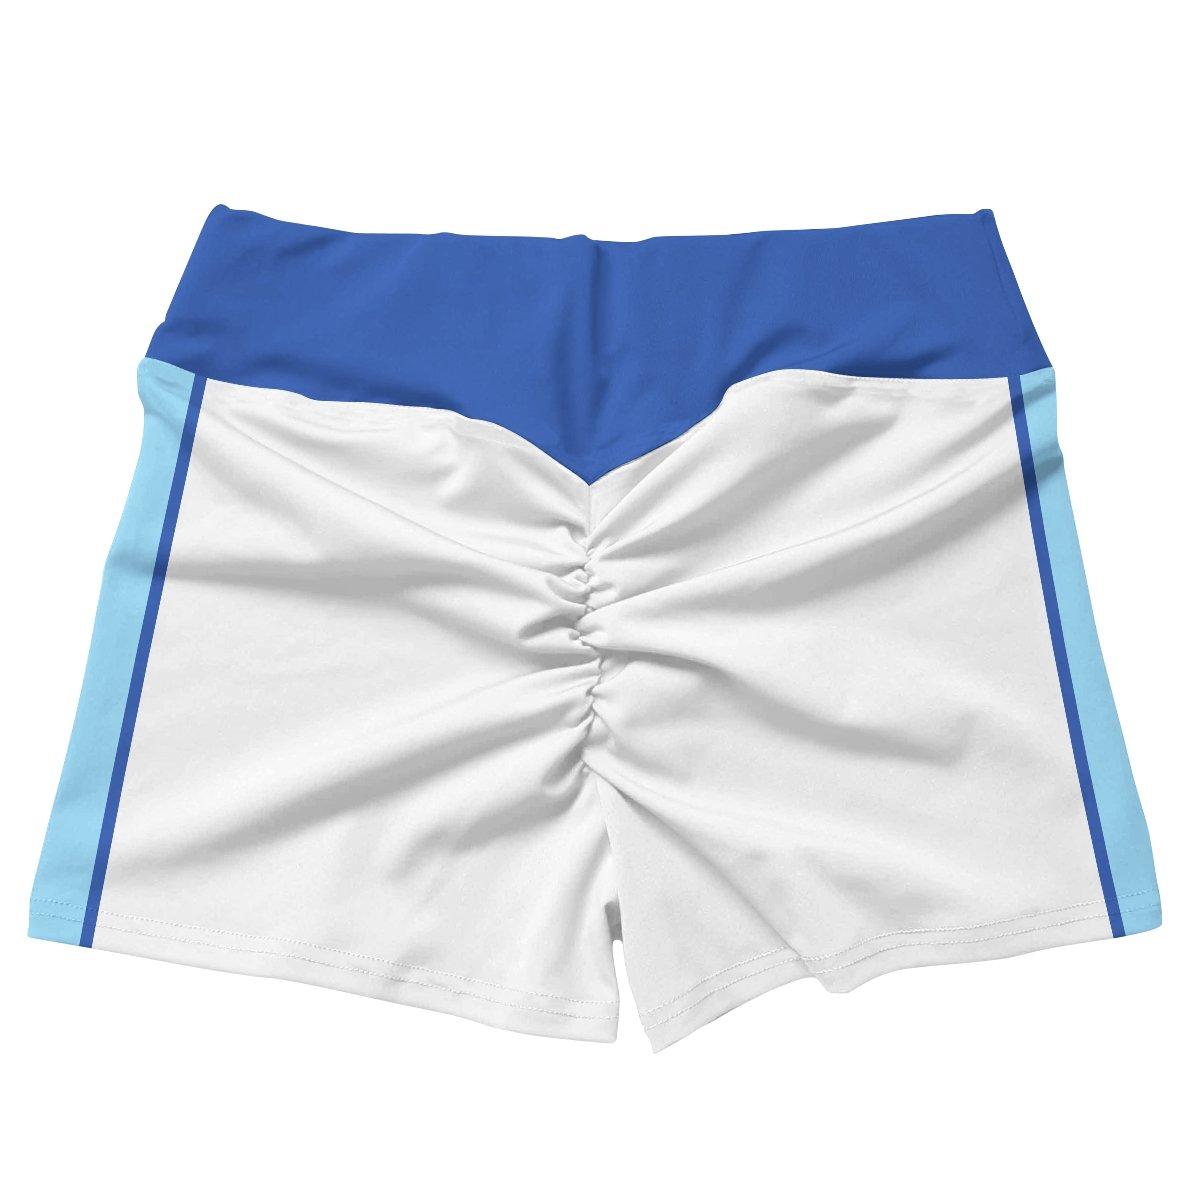 team kamomedai active wear set 103469 - Anime Swimsuits